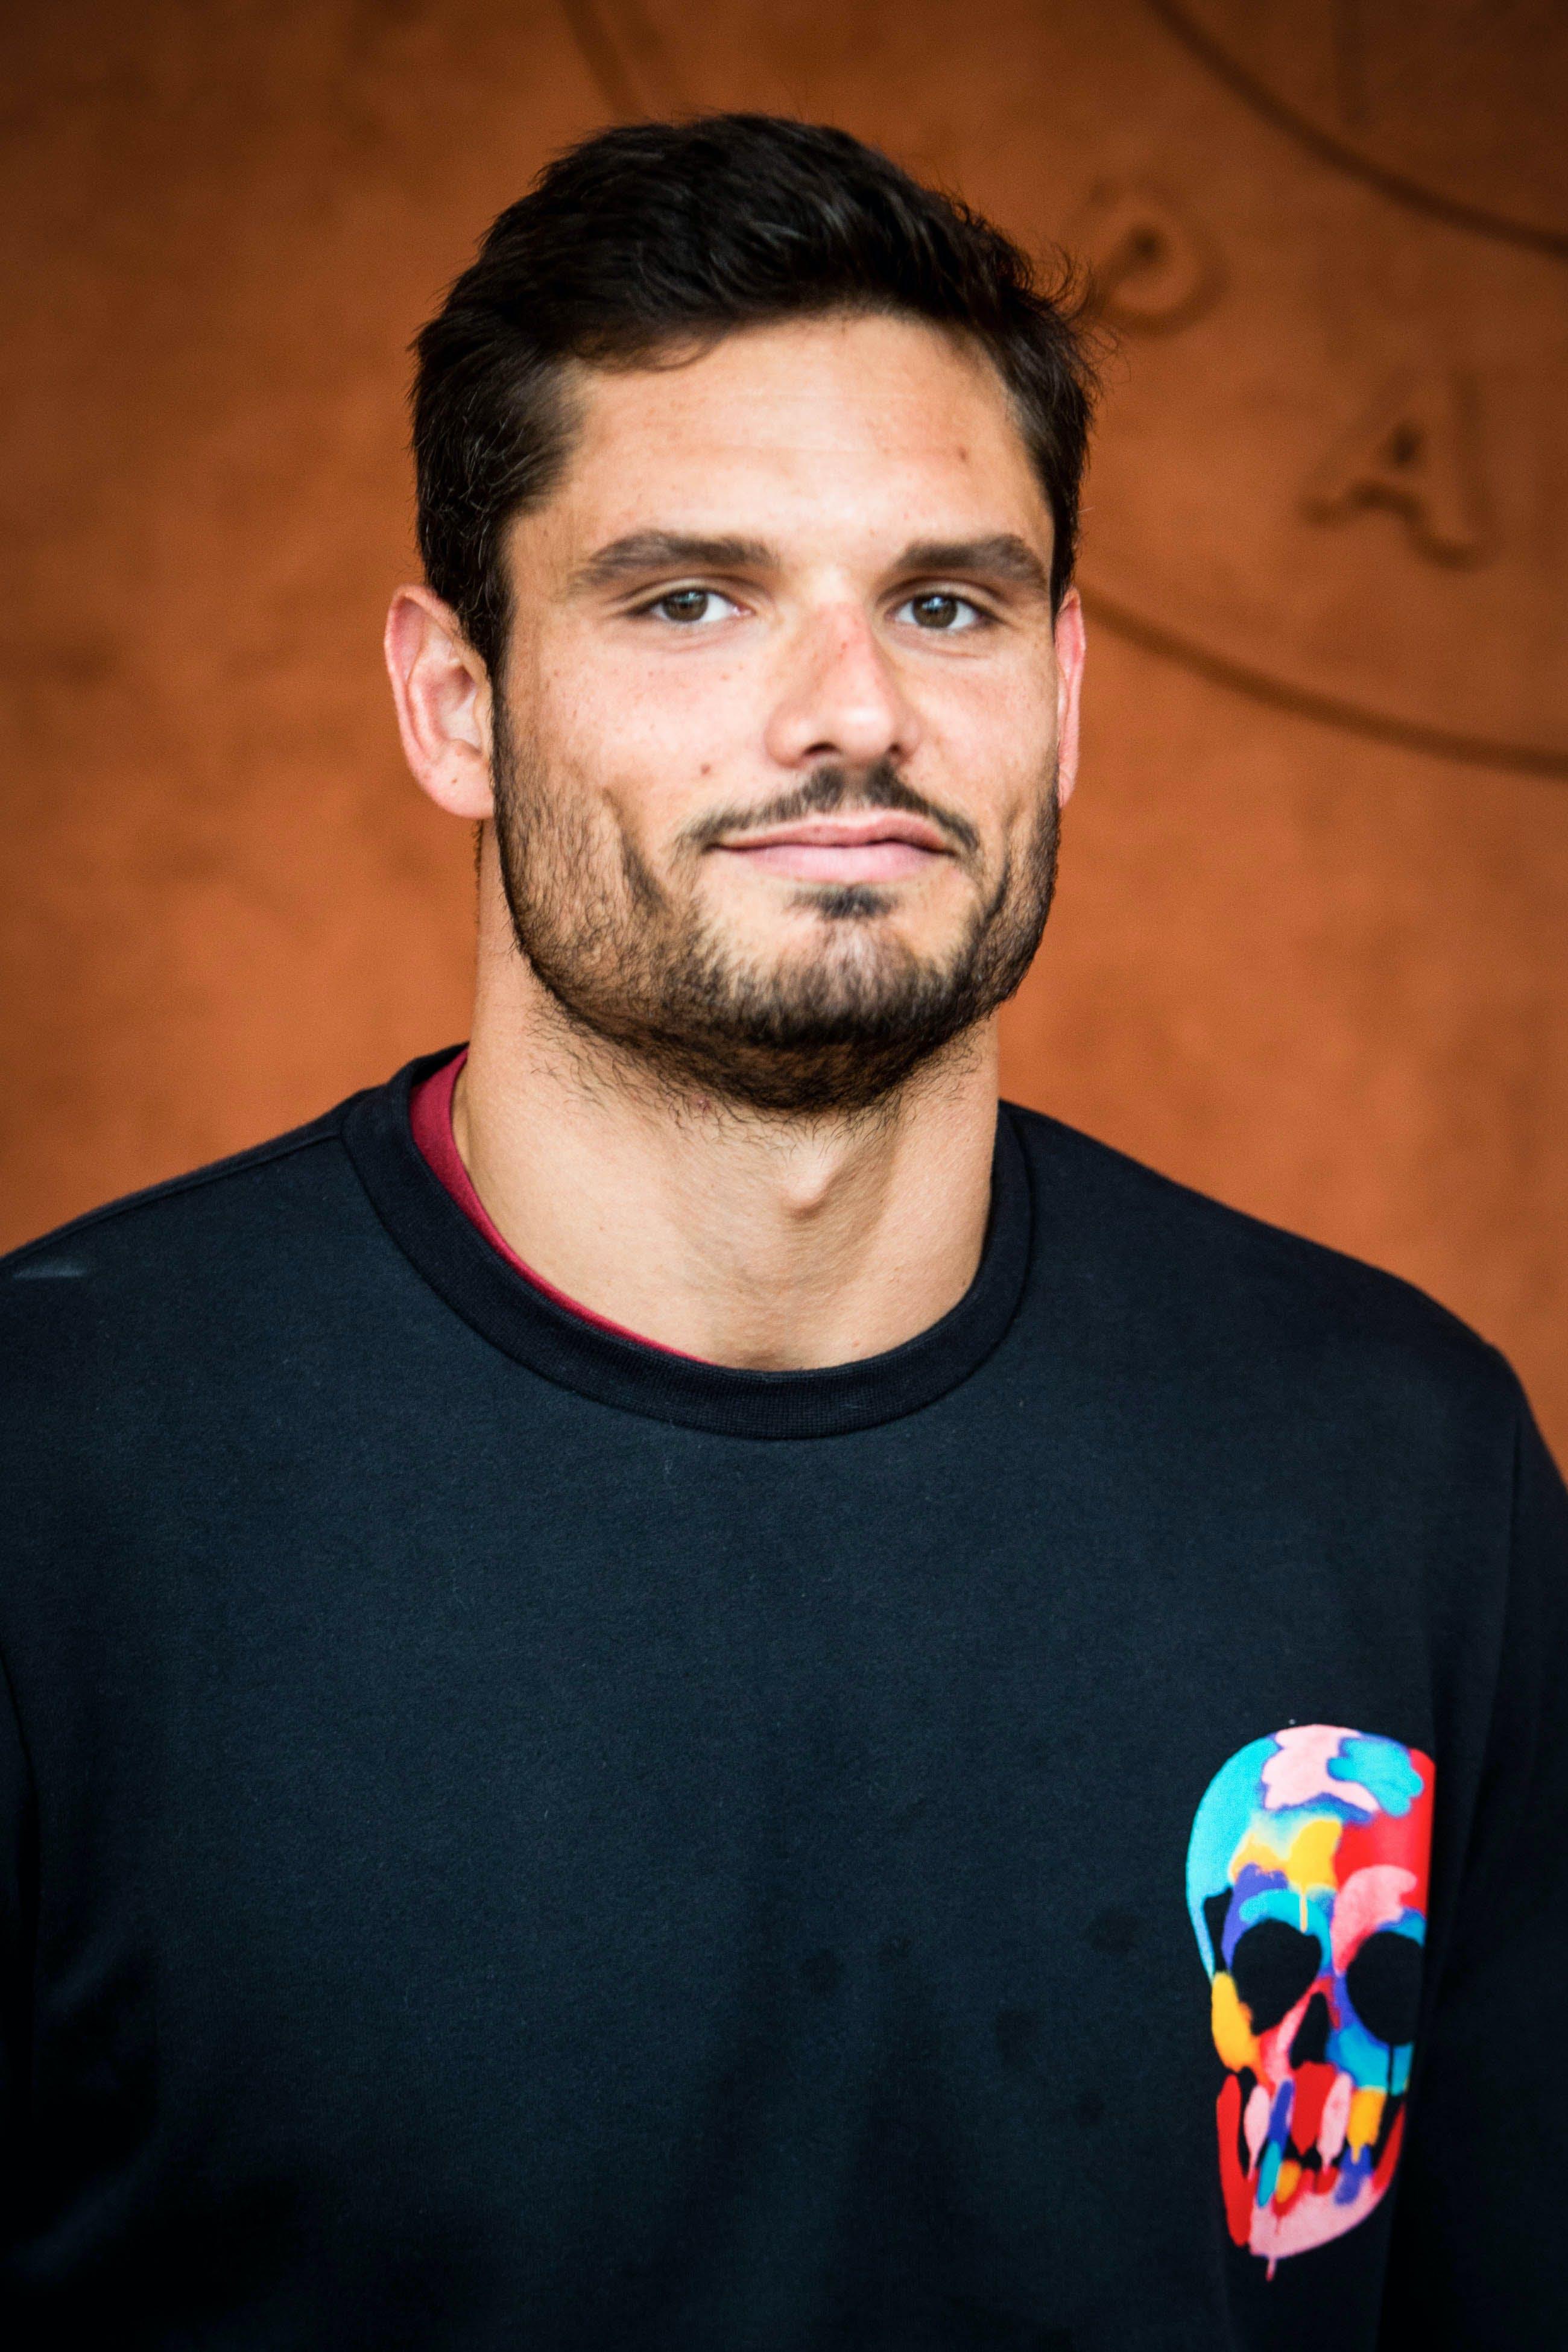 Olympich champion Florent Manaudou Roland-Garros 2019